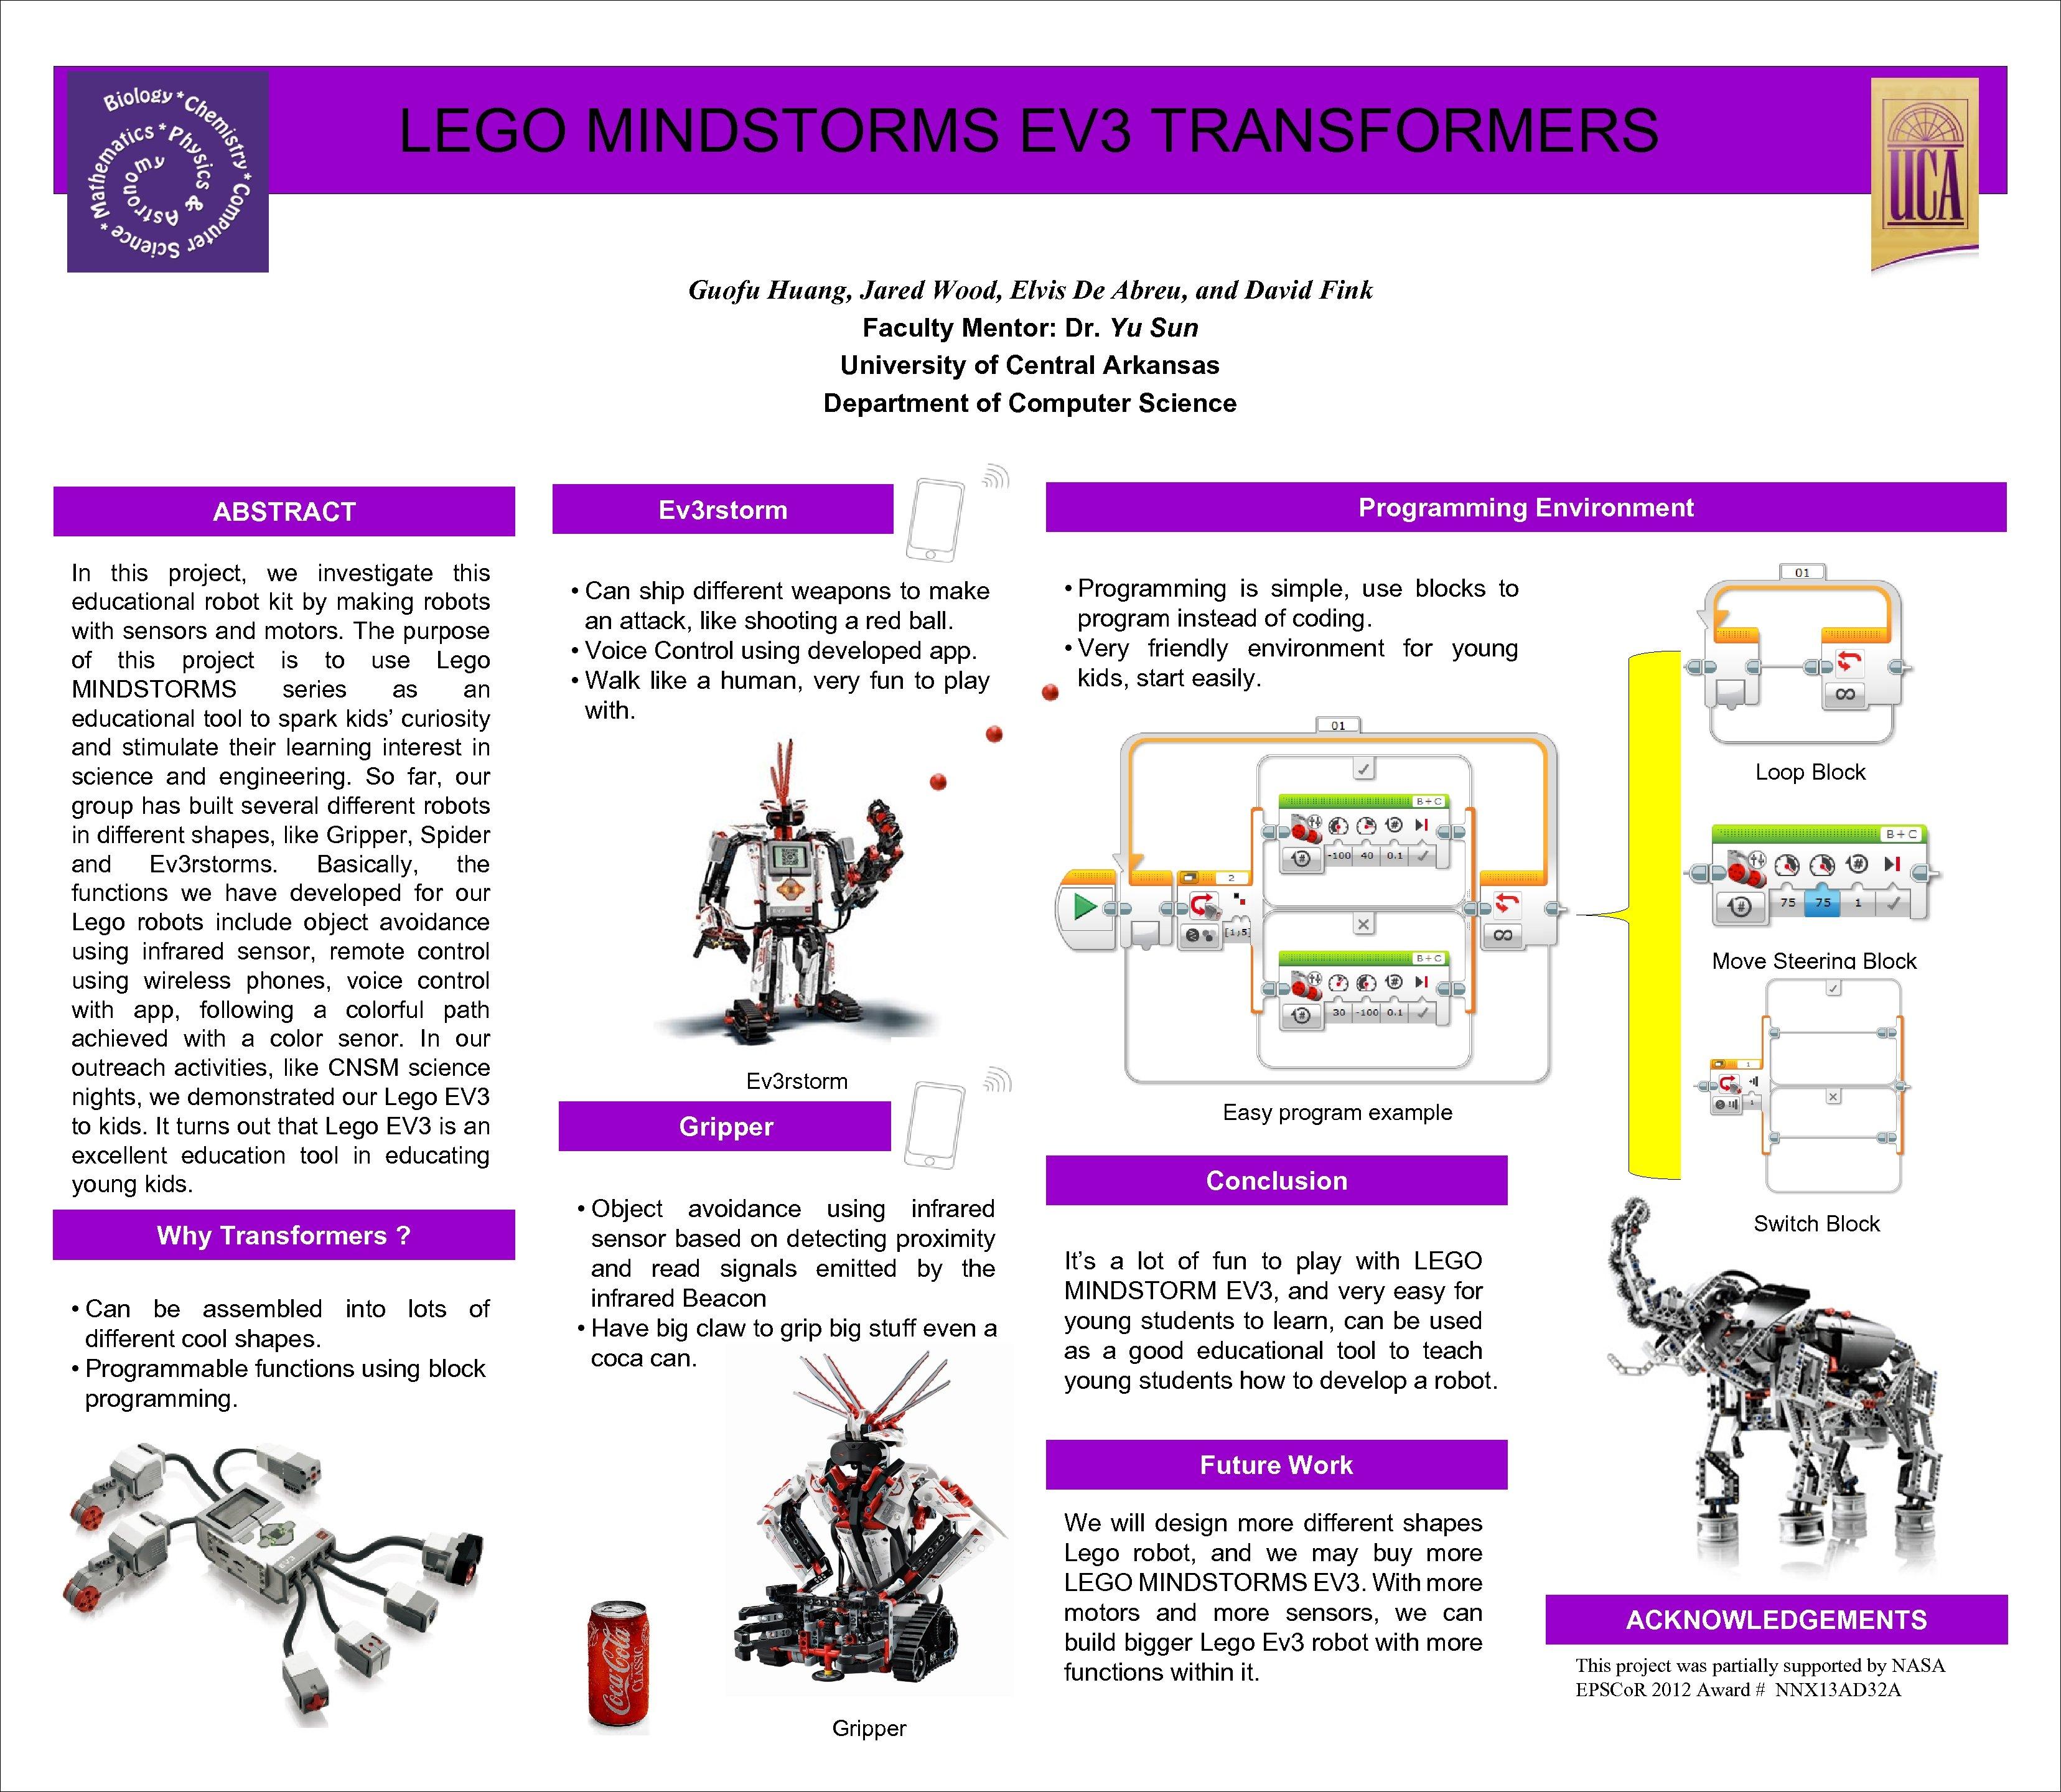 LEGO MINDSTORMS EV 3 TRANSFORMERS Guofu Huang, Jared Wood, Elvis De Abreu, and David